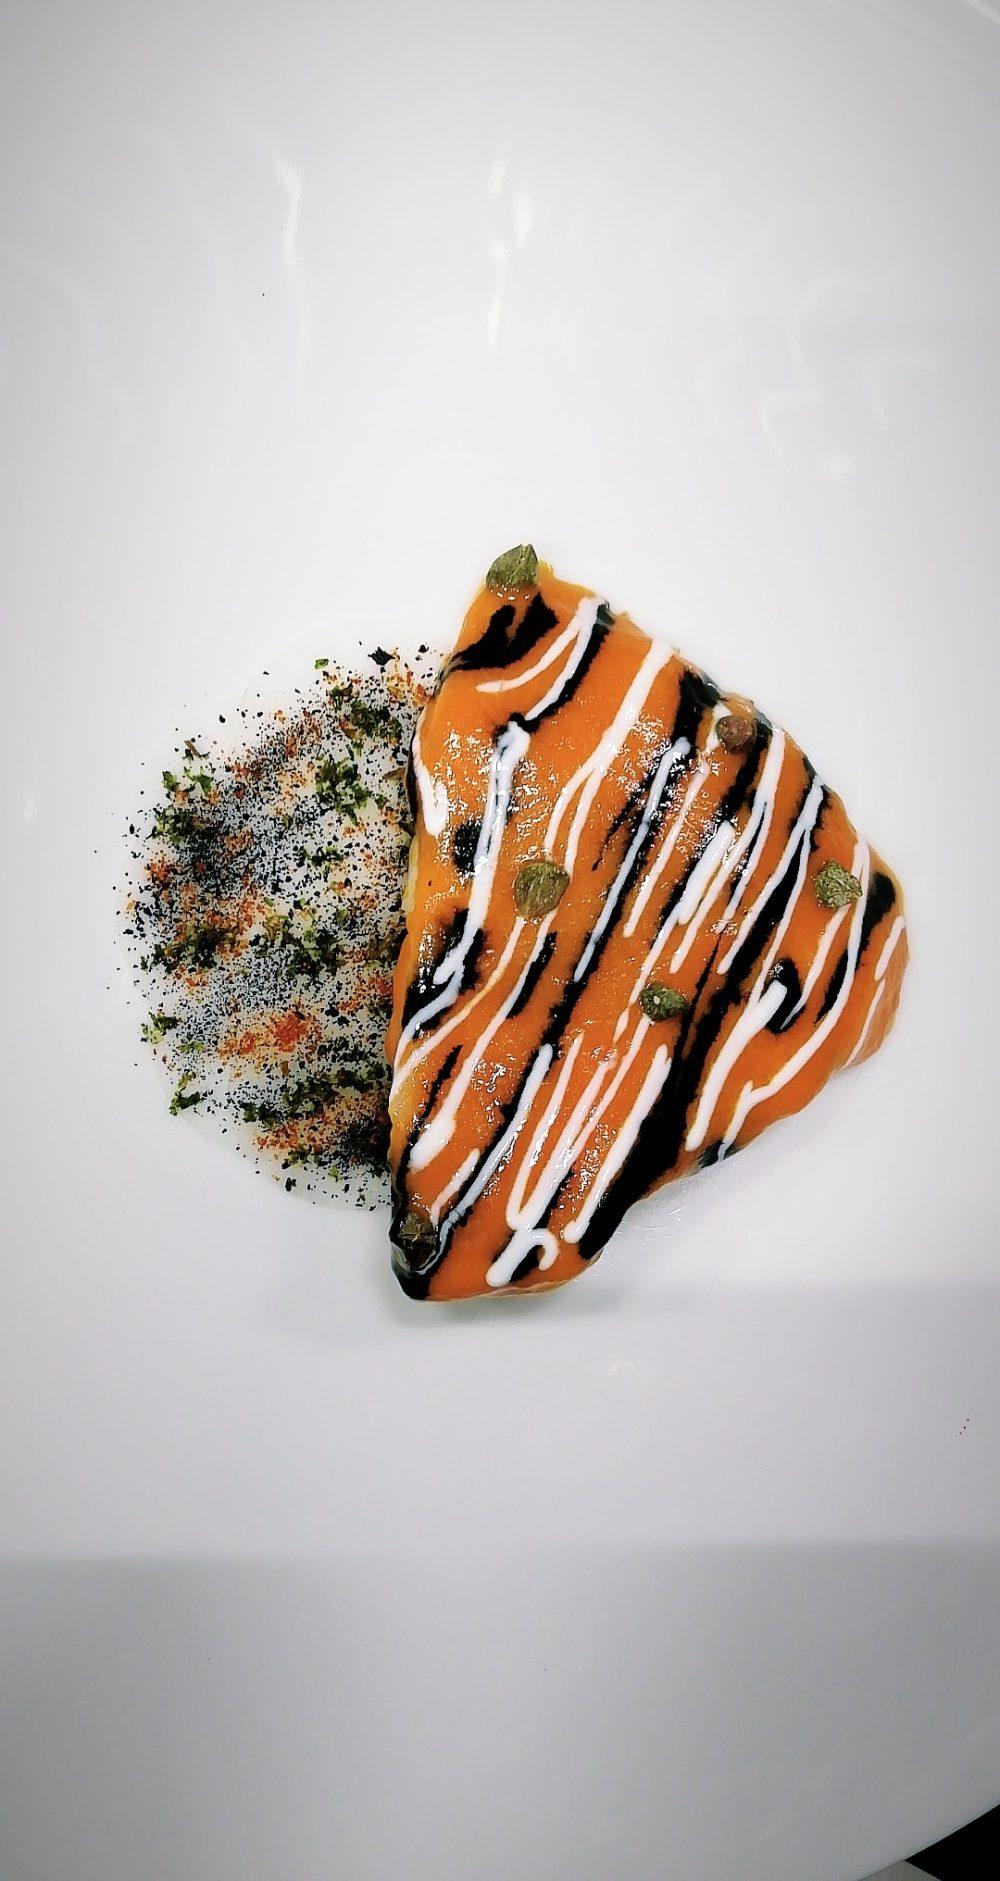 Gioja - Rombo alla Diavola - daikon peperoni e nero di seppia